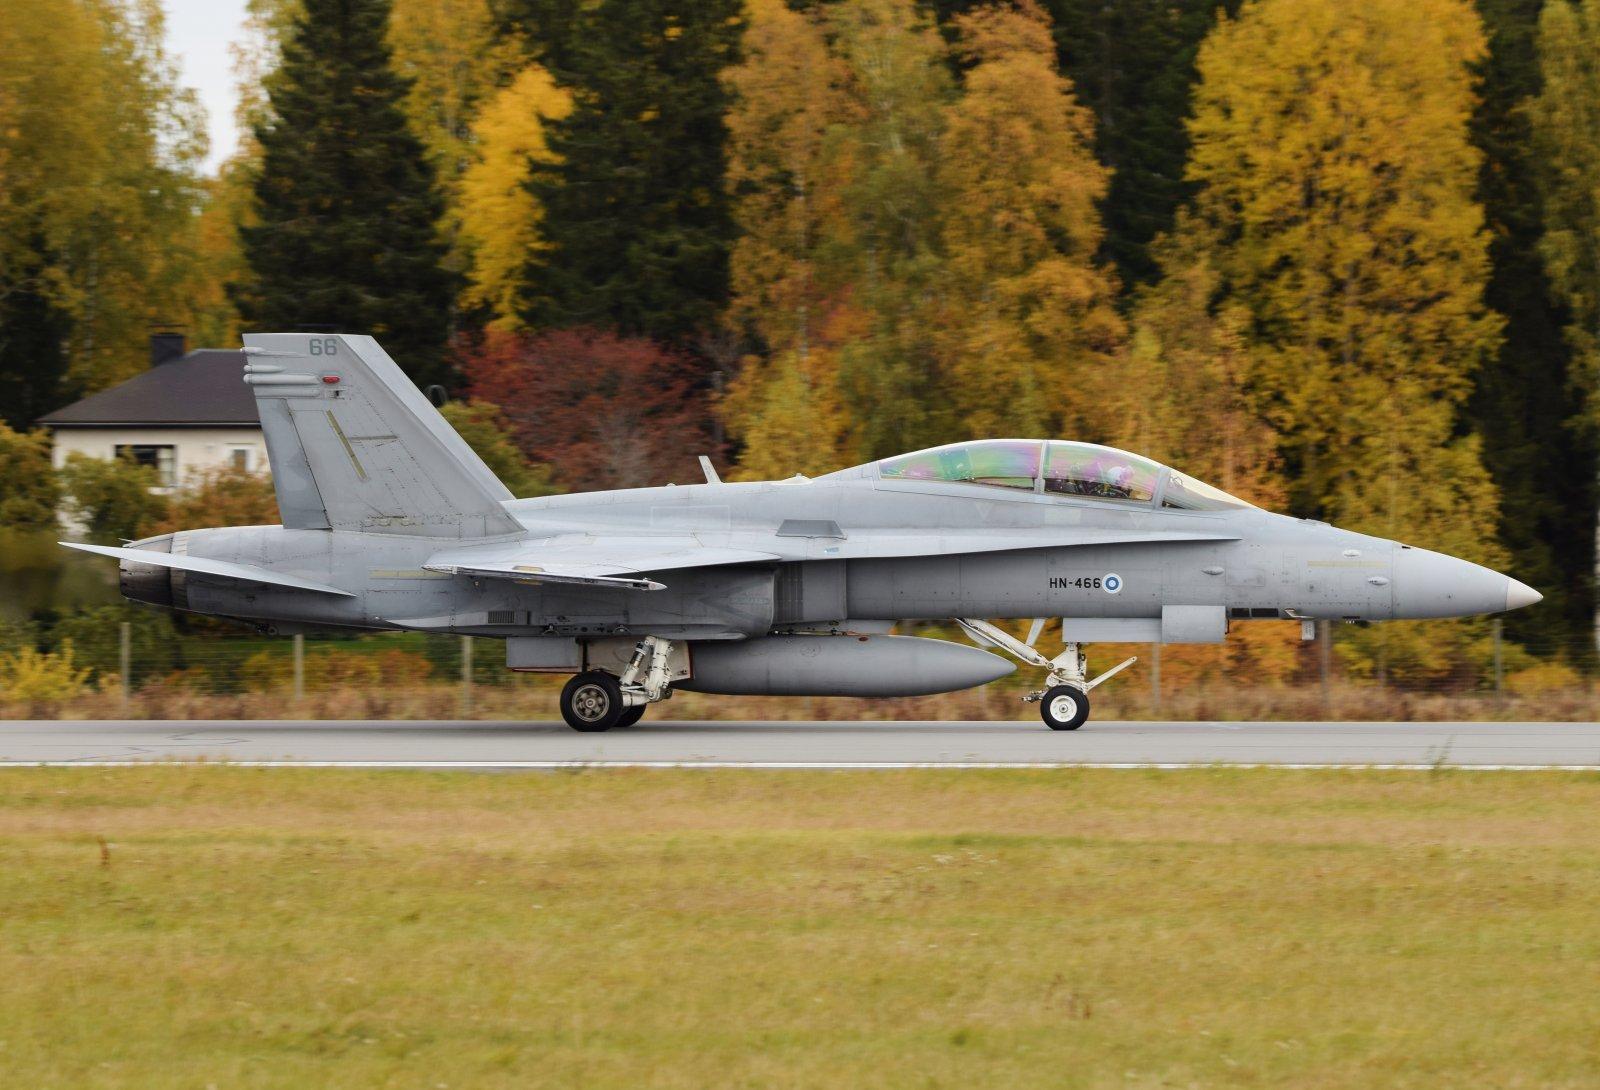 HN-466 - McDonnell Douglas F-18D Hornet - Suomen Ilmavoimat - 6.10.2019